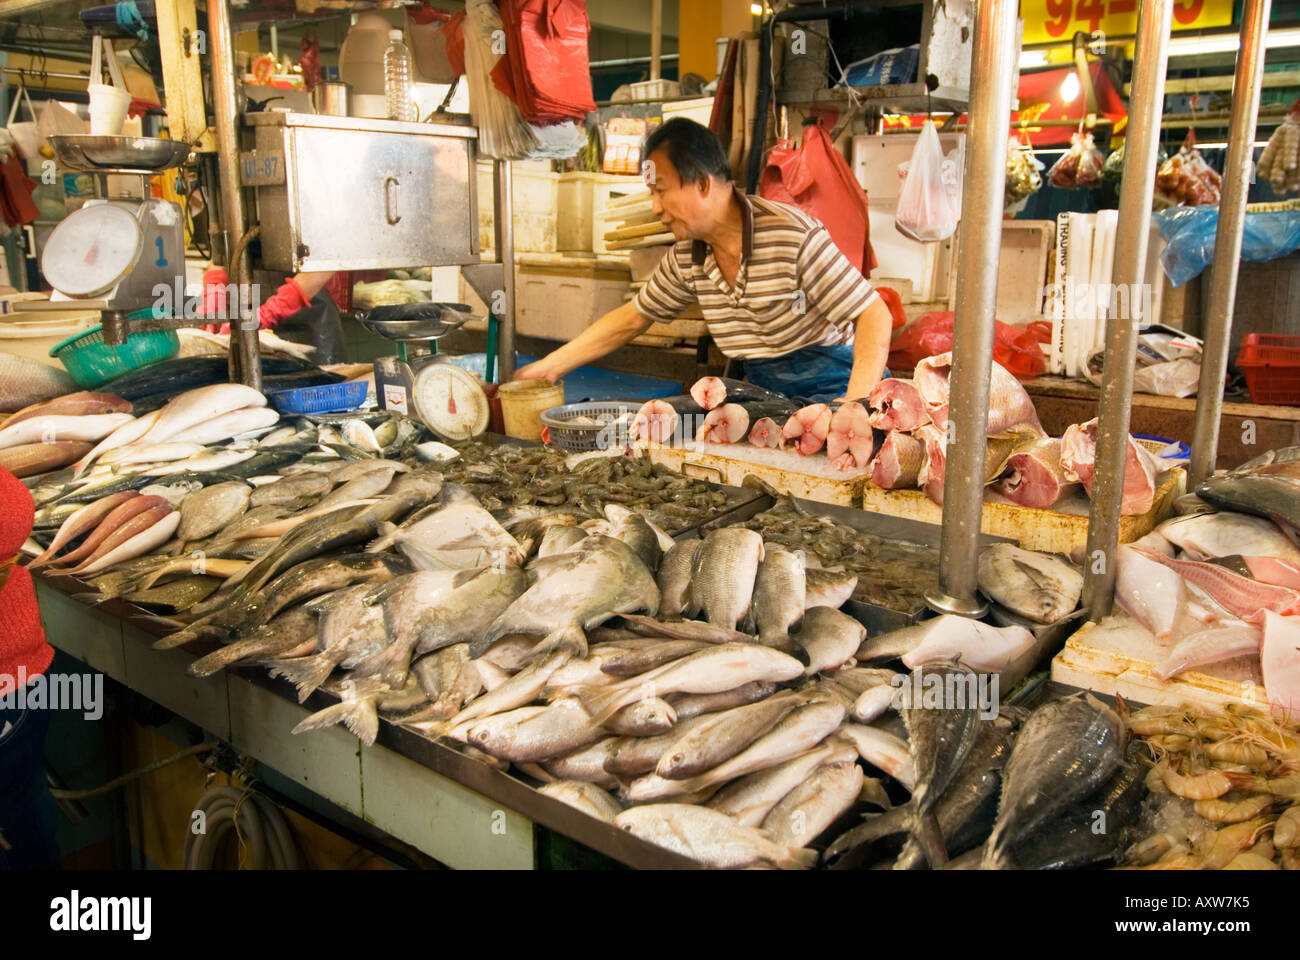 tekka centre little india fishmarket fish market singapore wet market stock photo 9669236 alamy. Black Bedroom Furniture Sets. Home Design Ideas